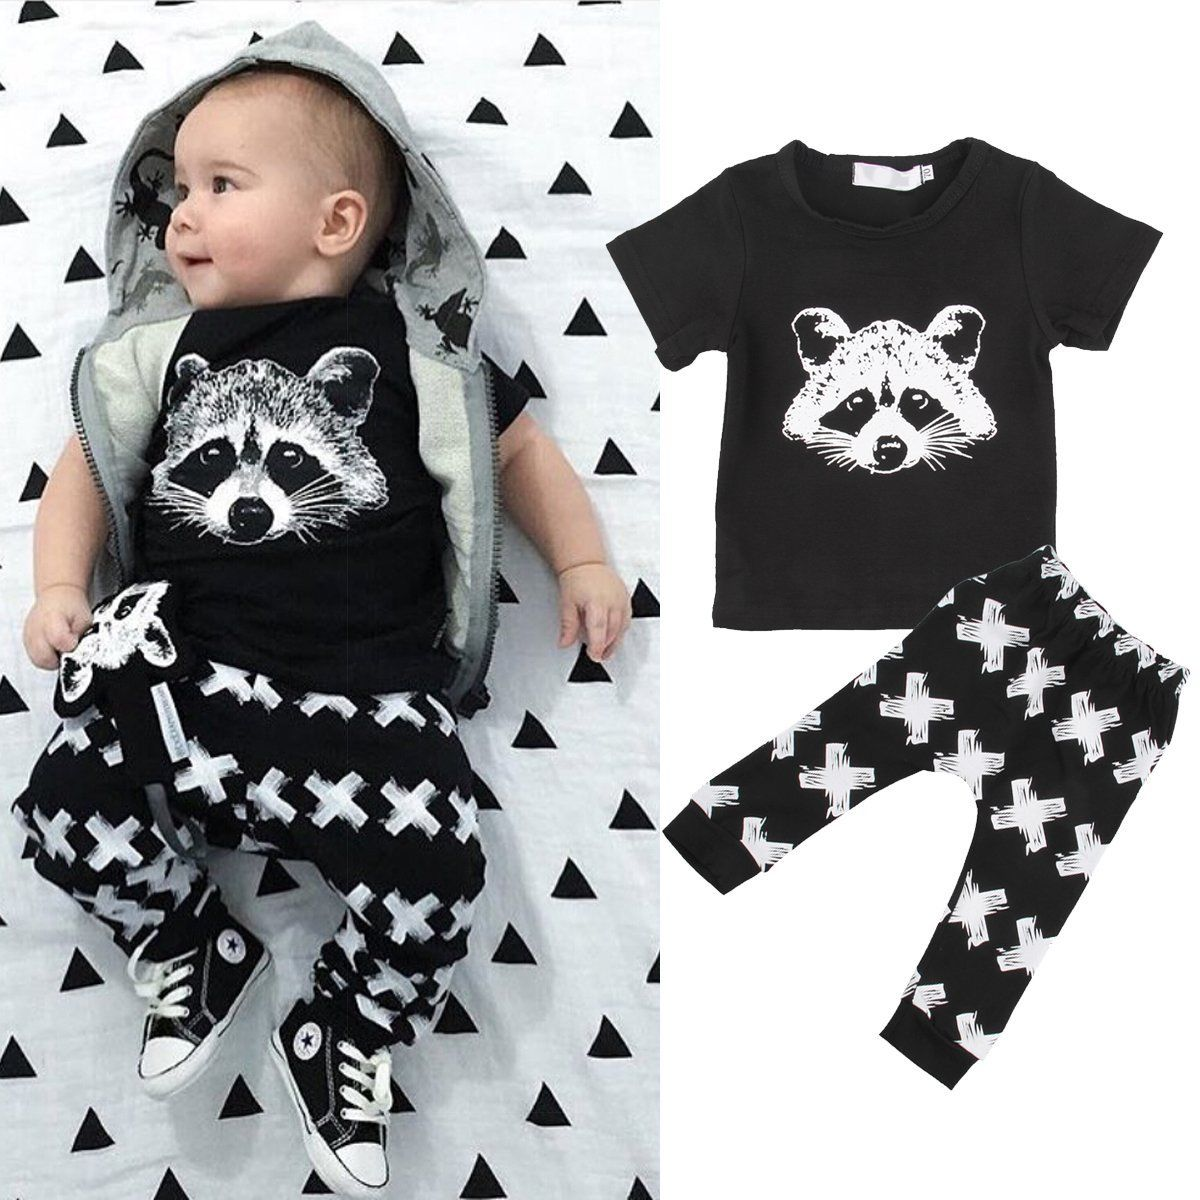 Newborn Toddler Kids Baby Boy T-shirt Tops+Long Pants 2PCS Outfits Clothes Set